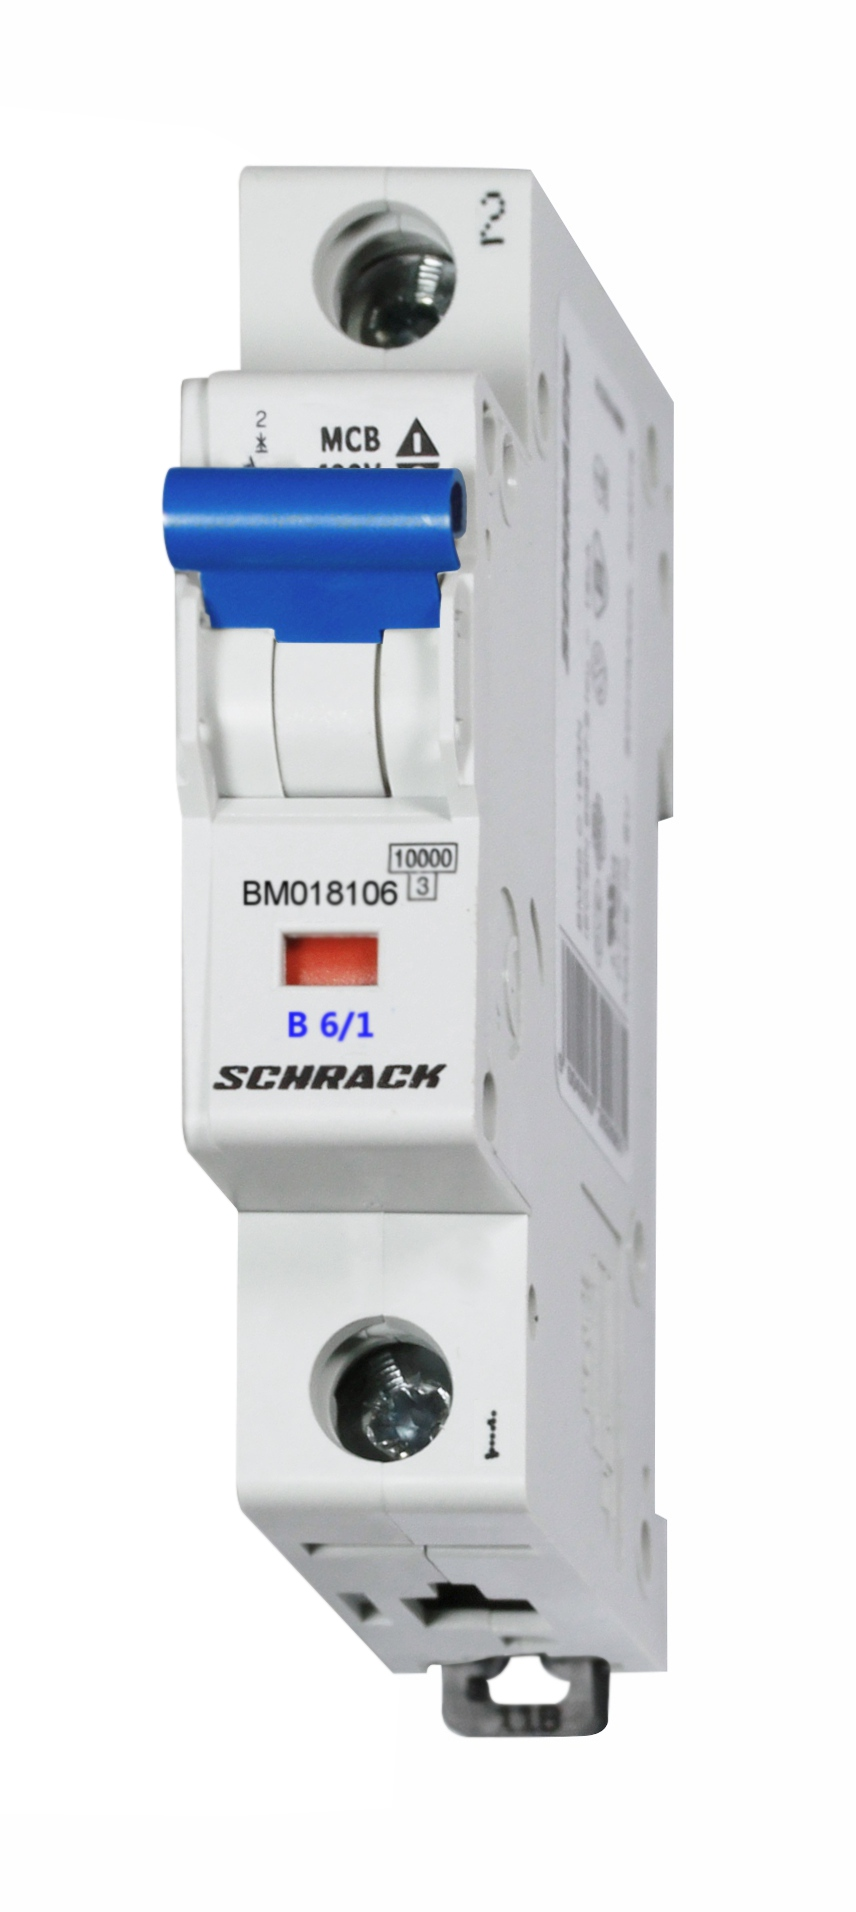 1 Stk Sicherungsautomat, Kennlinie B, 6A, 1-polig, 10kA BM018106--